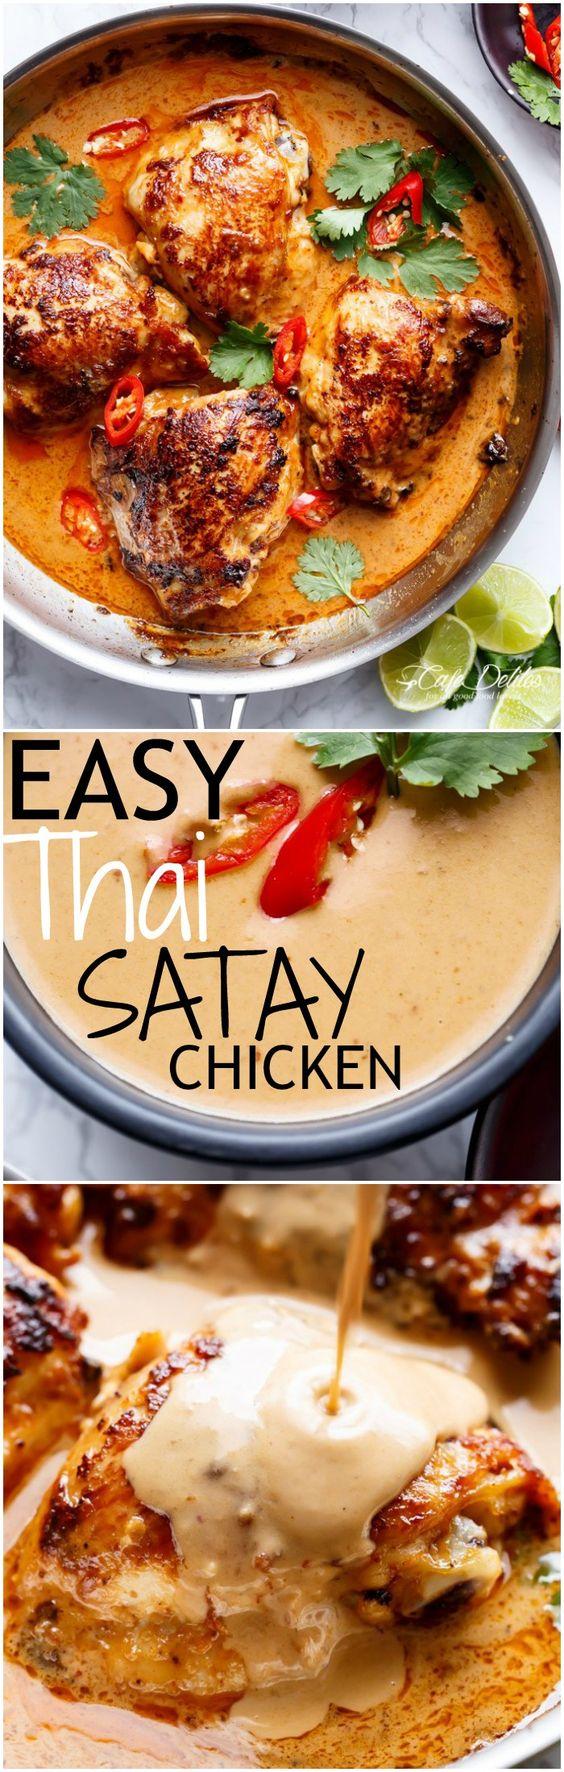 Easy Thai Satay Chicken | Recipe | Peanut Sauce, Chicken and Peanuts